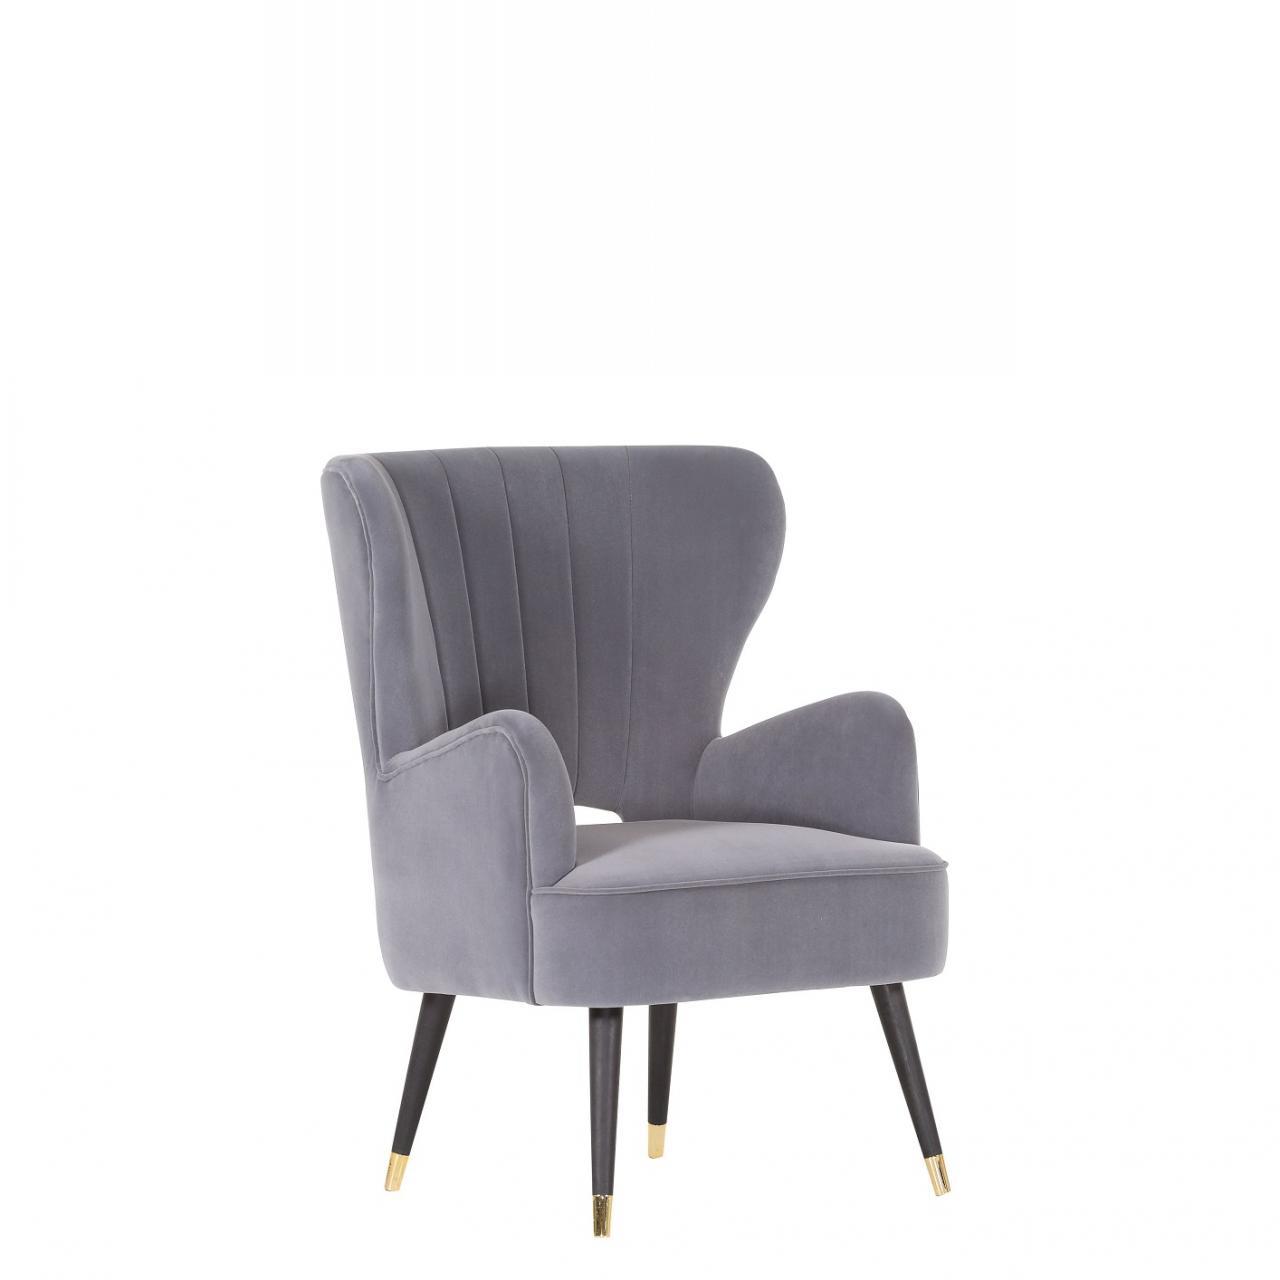 Sessel Performer Grau Modern Fernsehsessel Wohnzimmer Relaxsessel